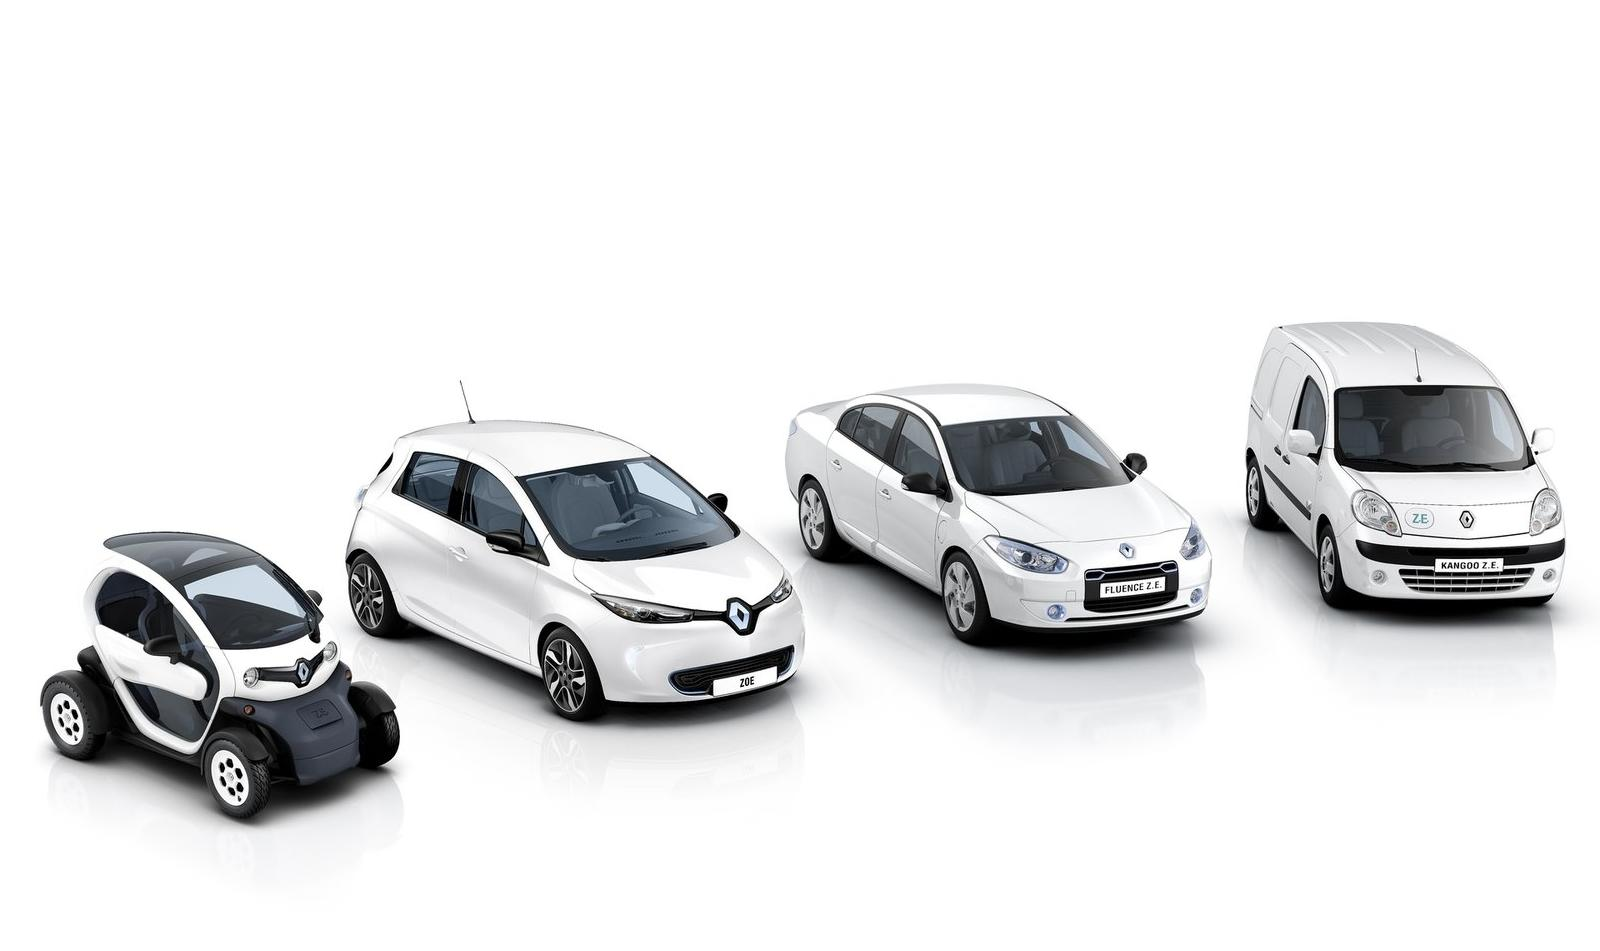 2013-Renault-gamaZE